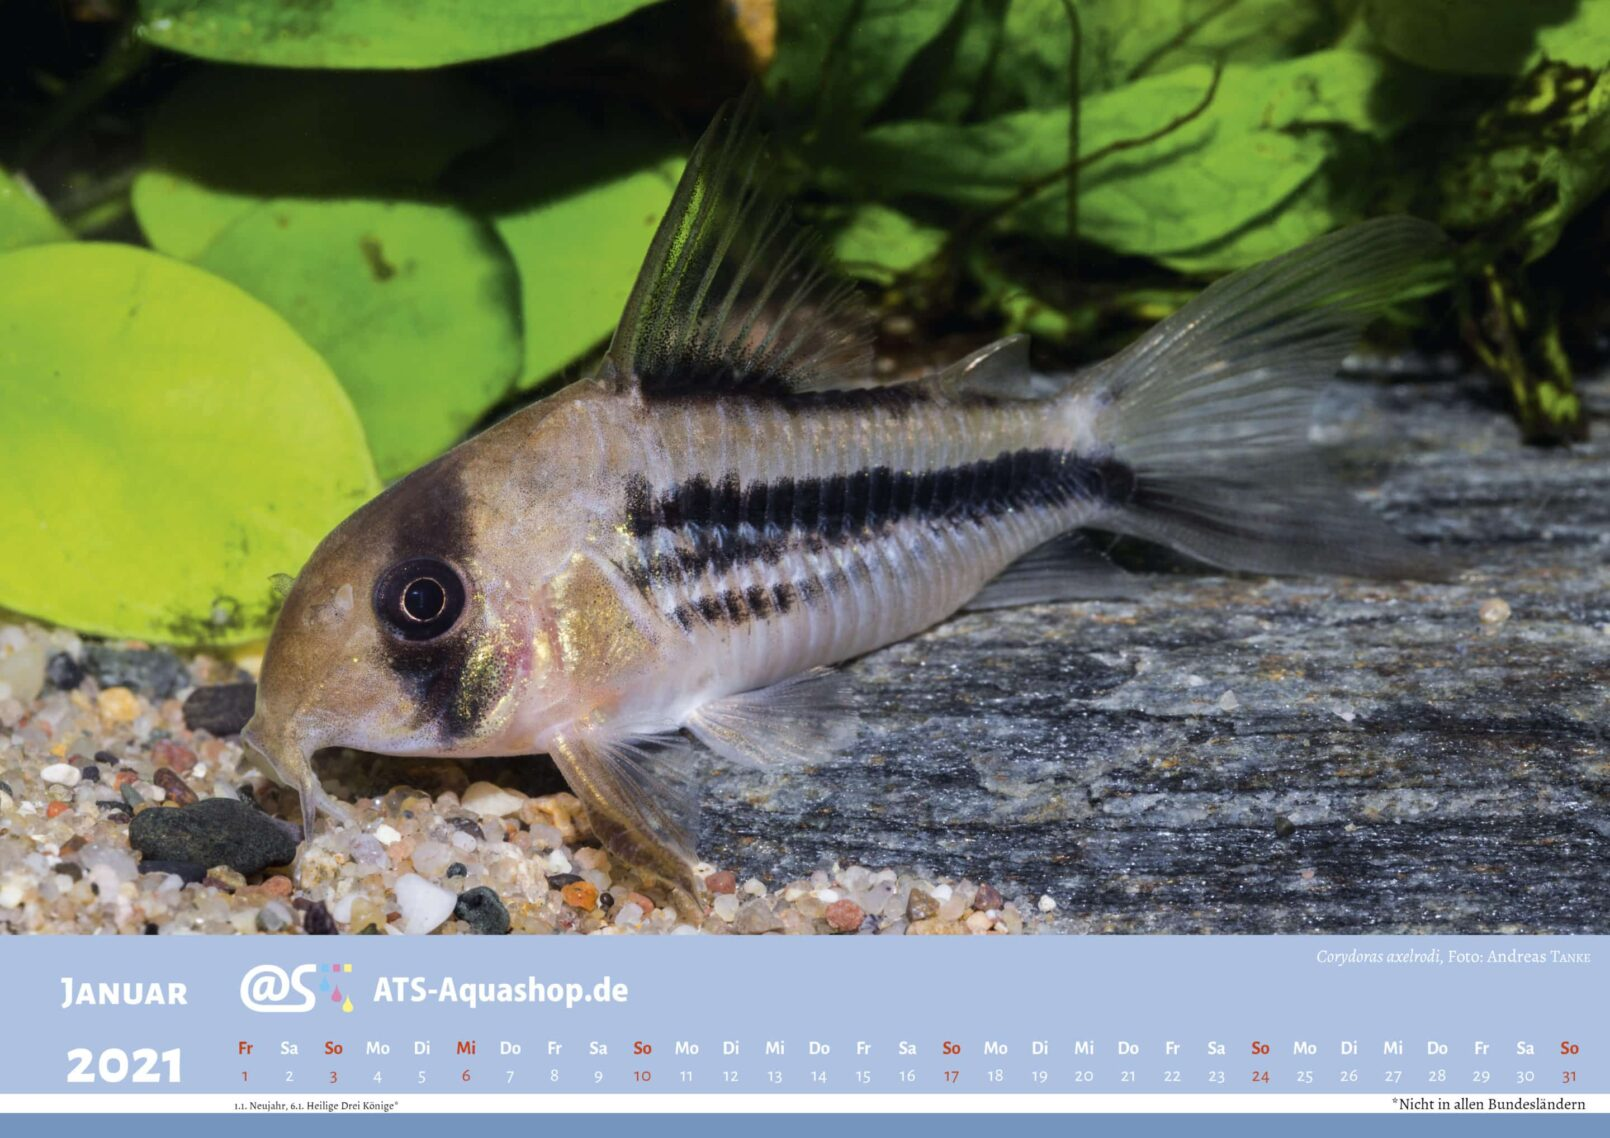 ATS-Aquashop Foto Jahreskalender 2021 DIN A3 (Januar): Corydoras axelrodi